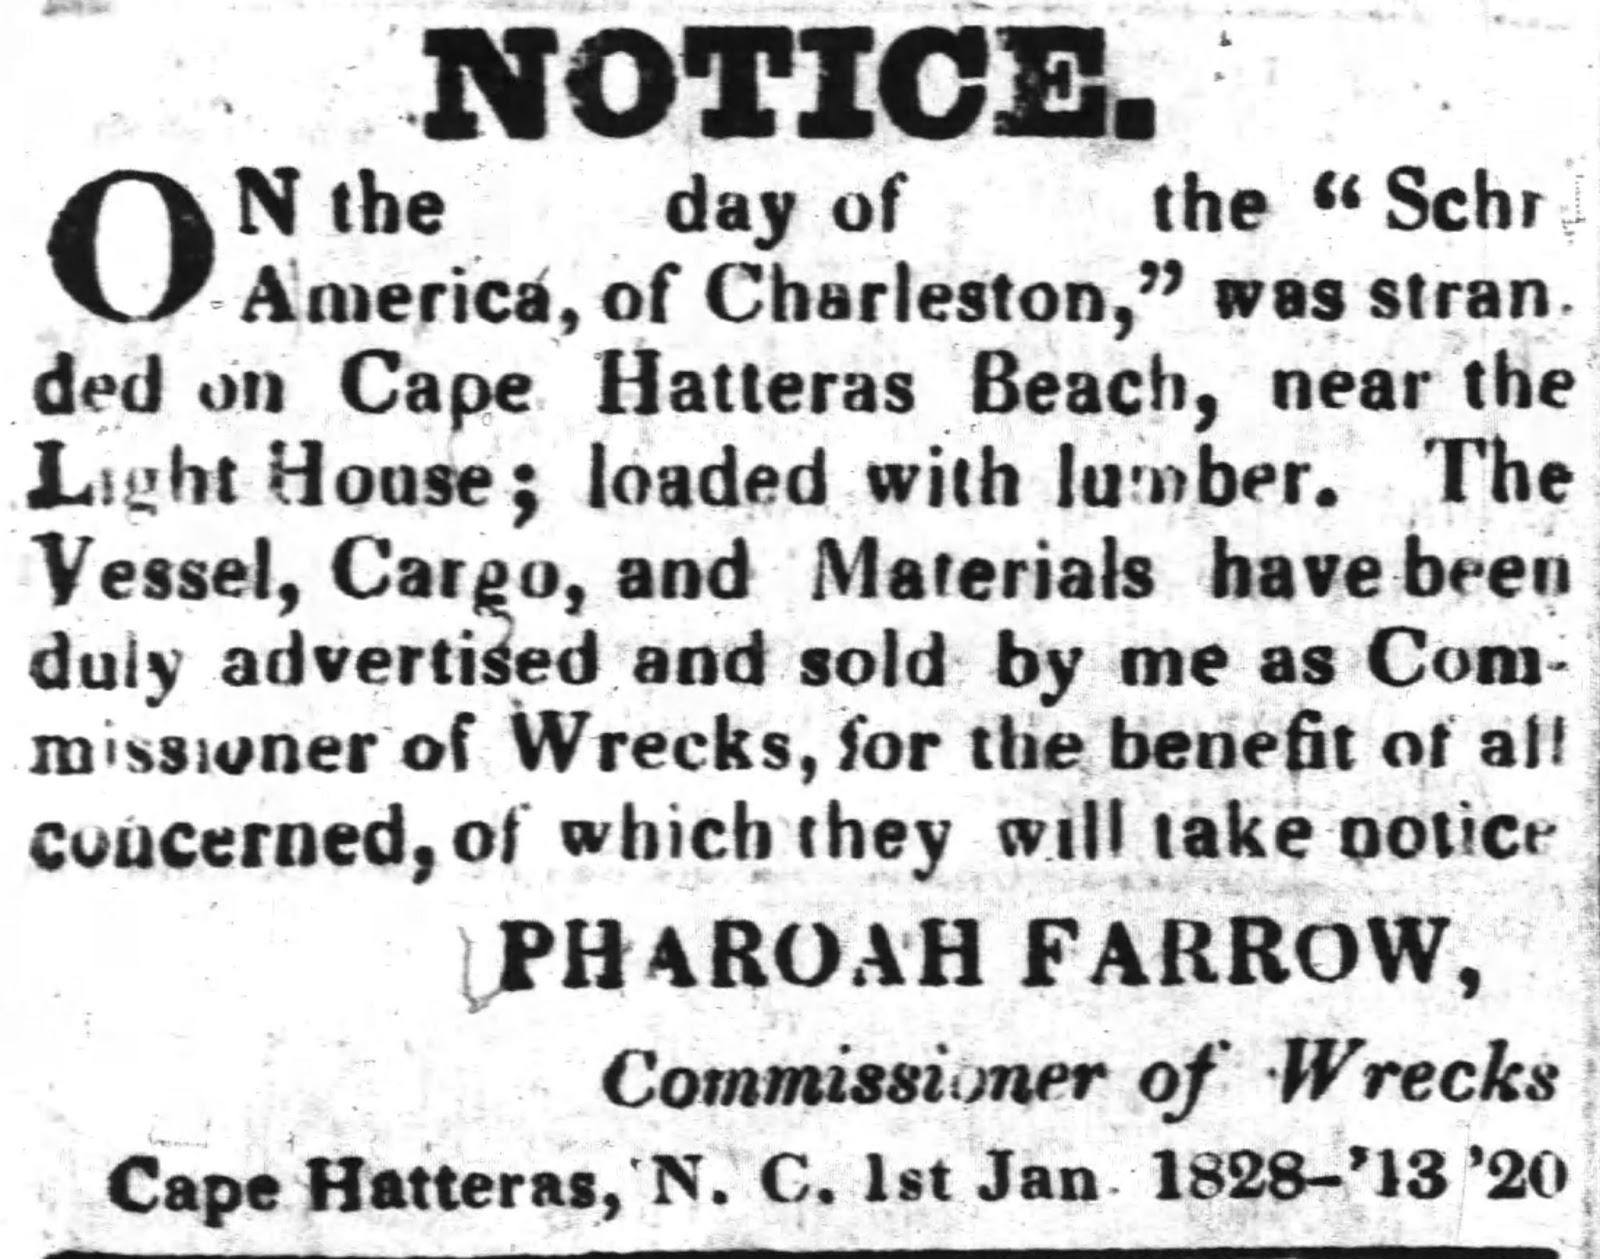 North carolina shipwrecks april 2012 schooner america 1828 nvjuhfo Image collections